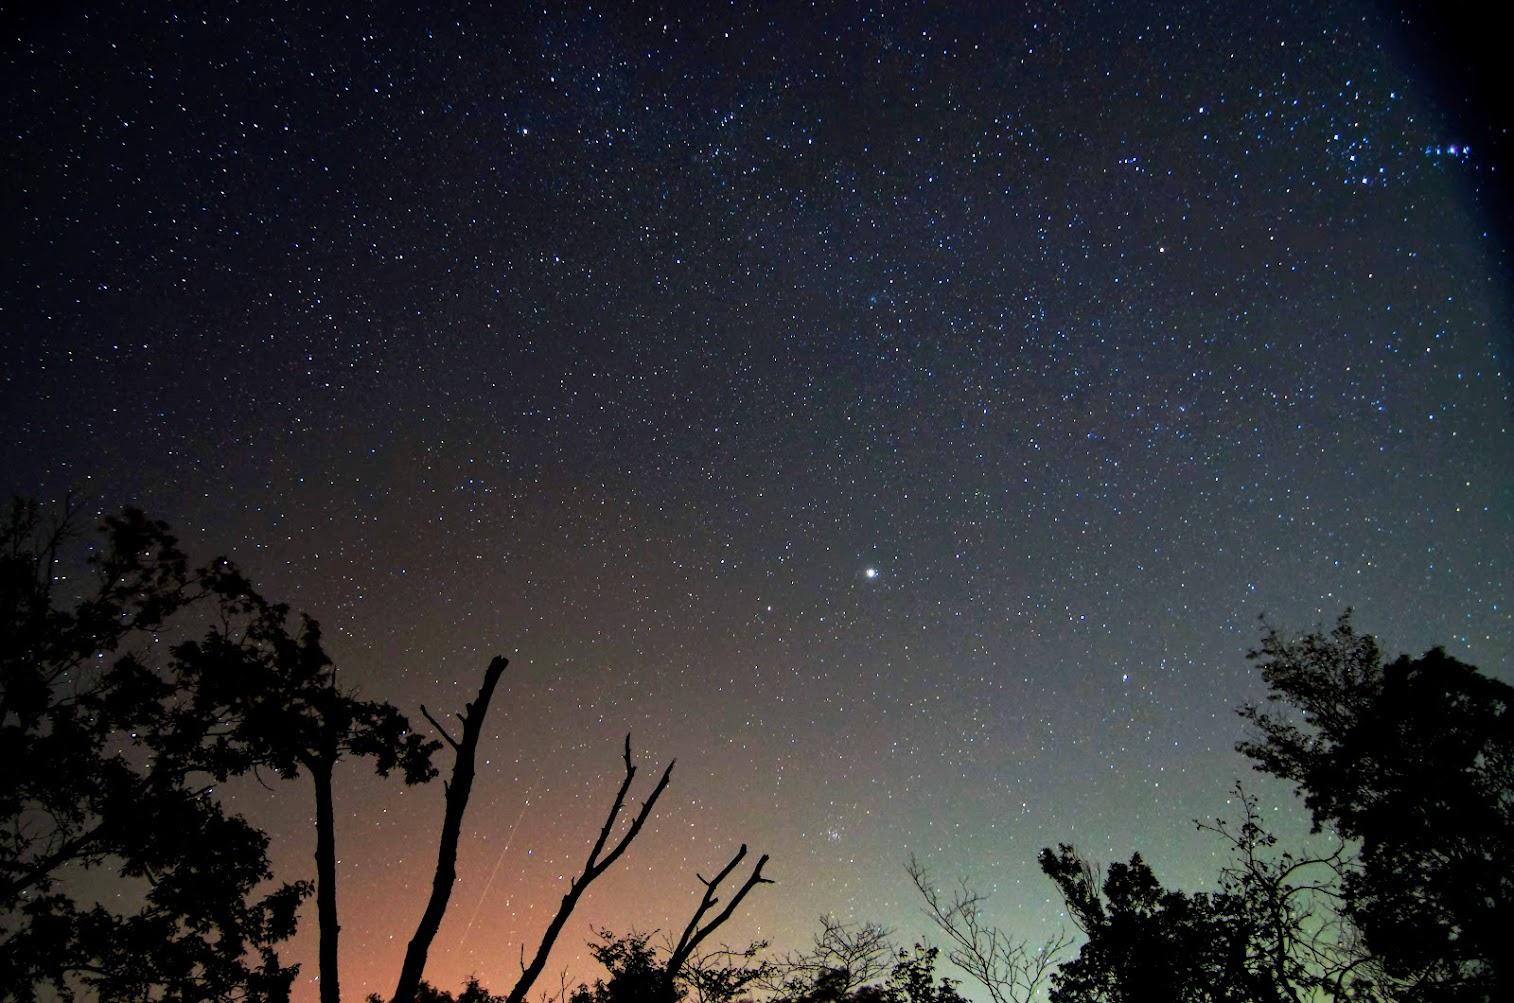 A Taurid Meteor